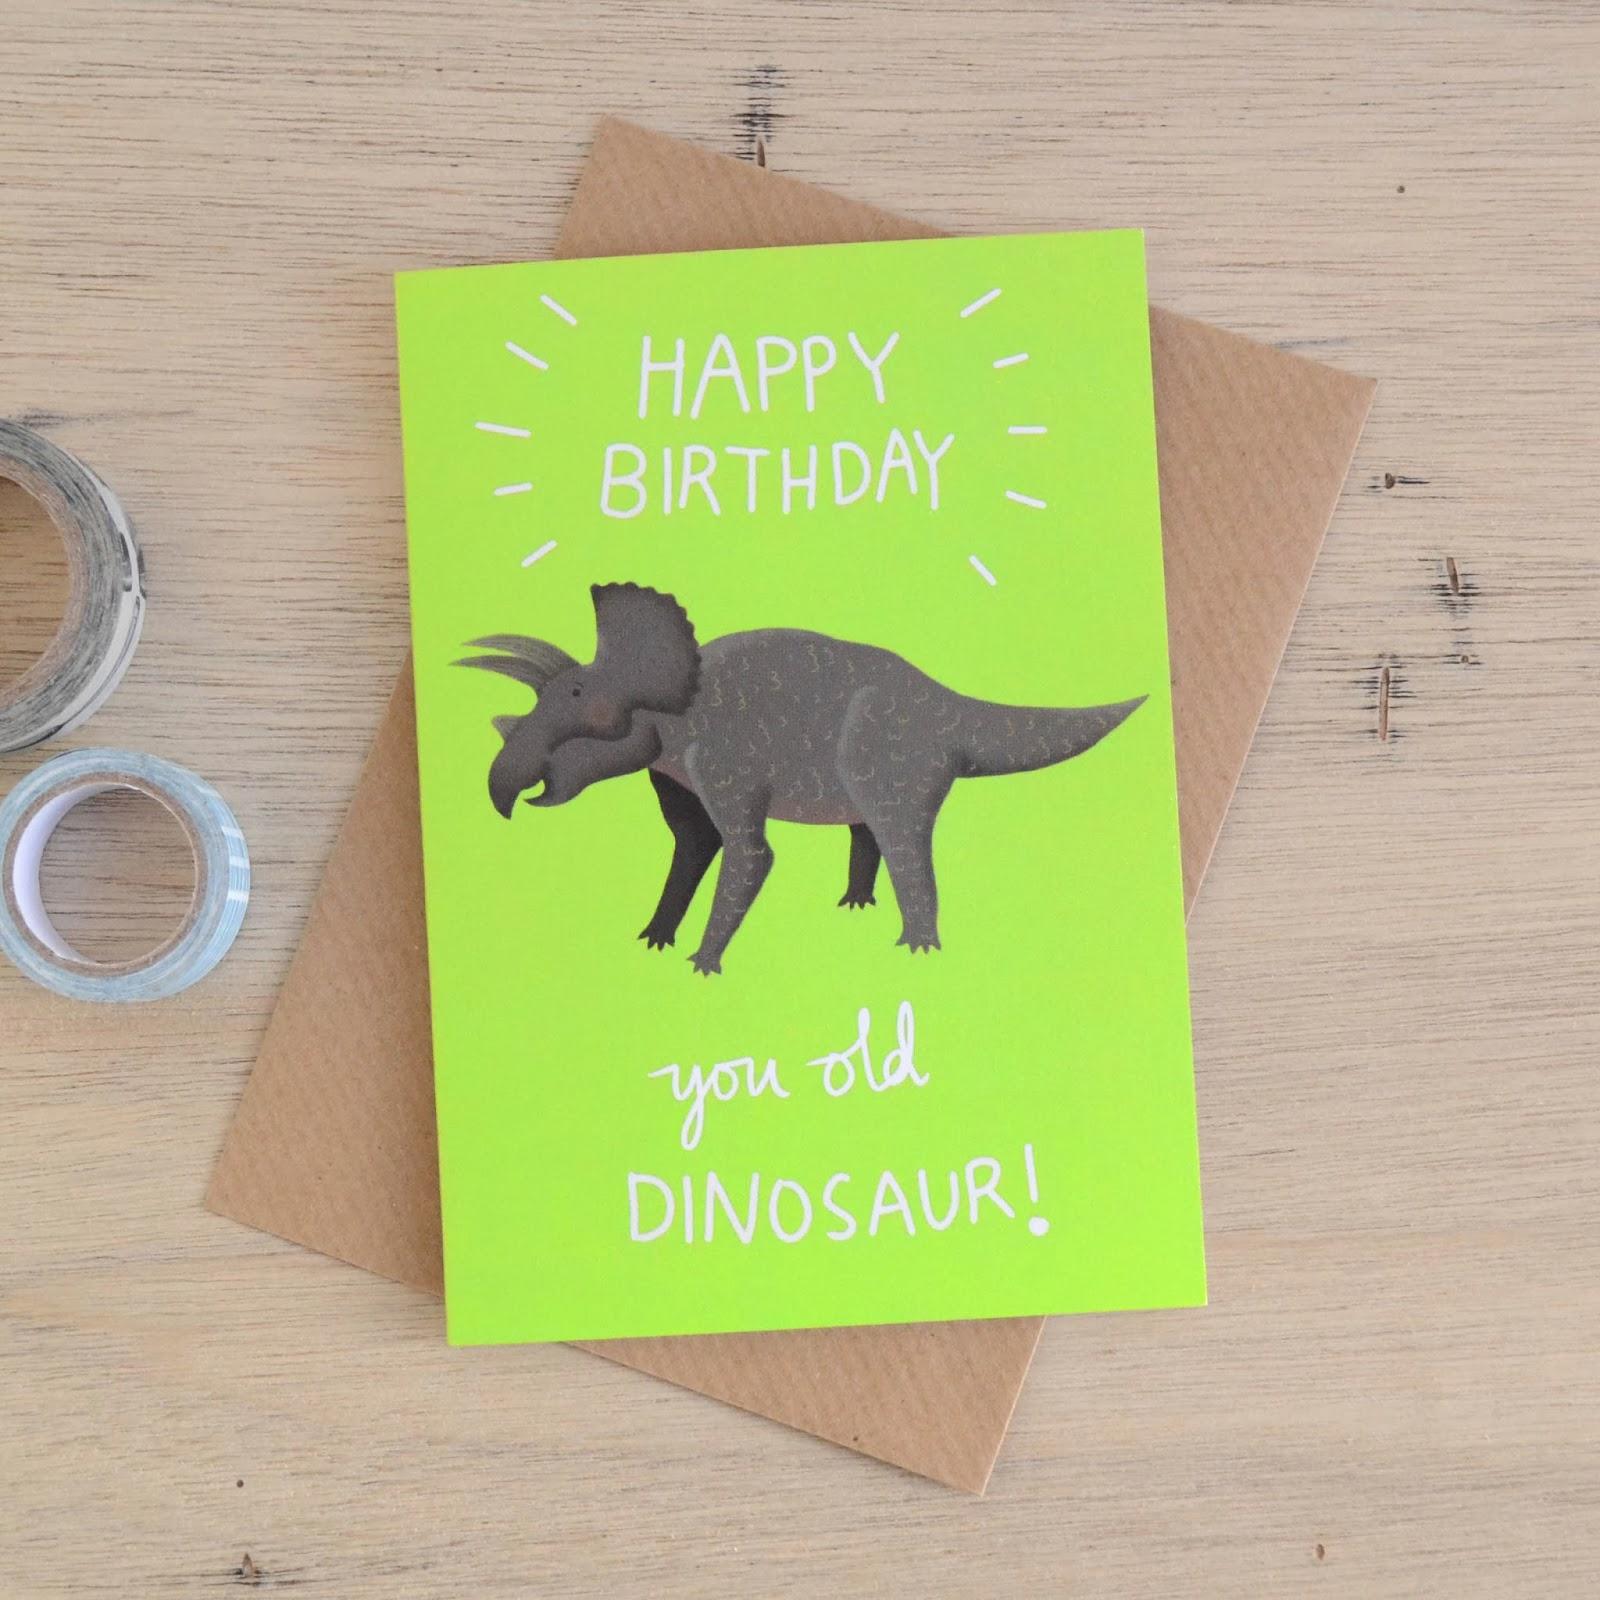 http://folksy.com/items/5725531-You-Old-Dinosaur-Birthday-Card